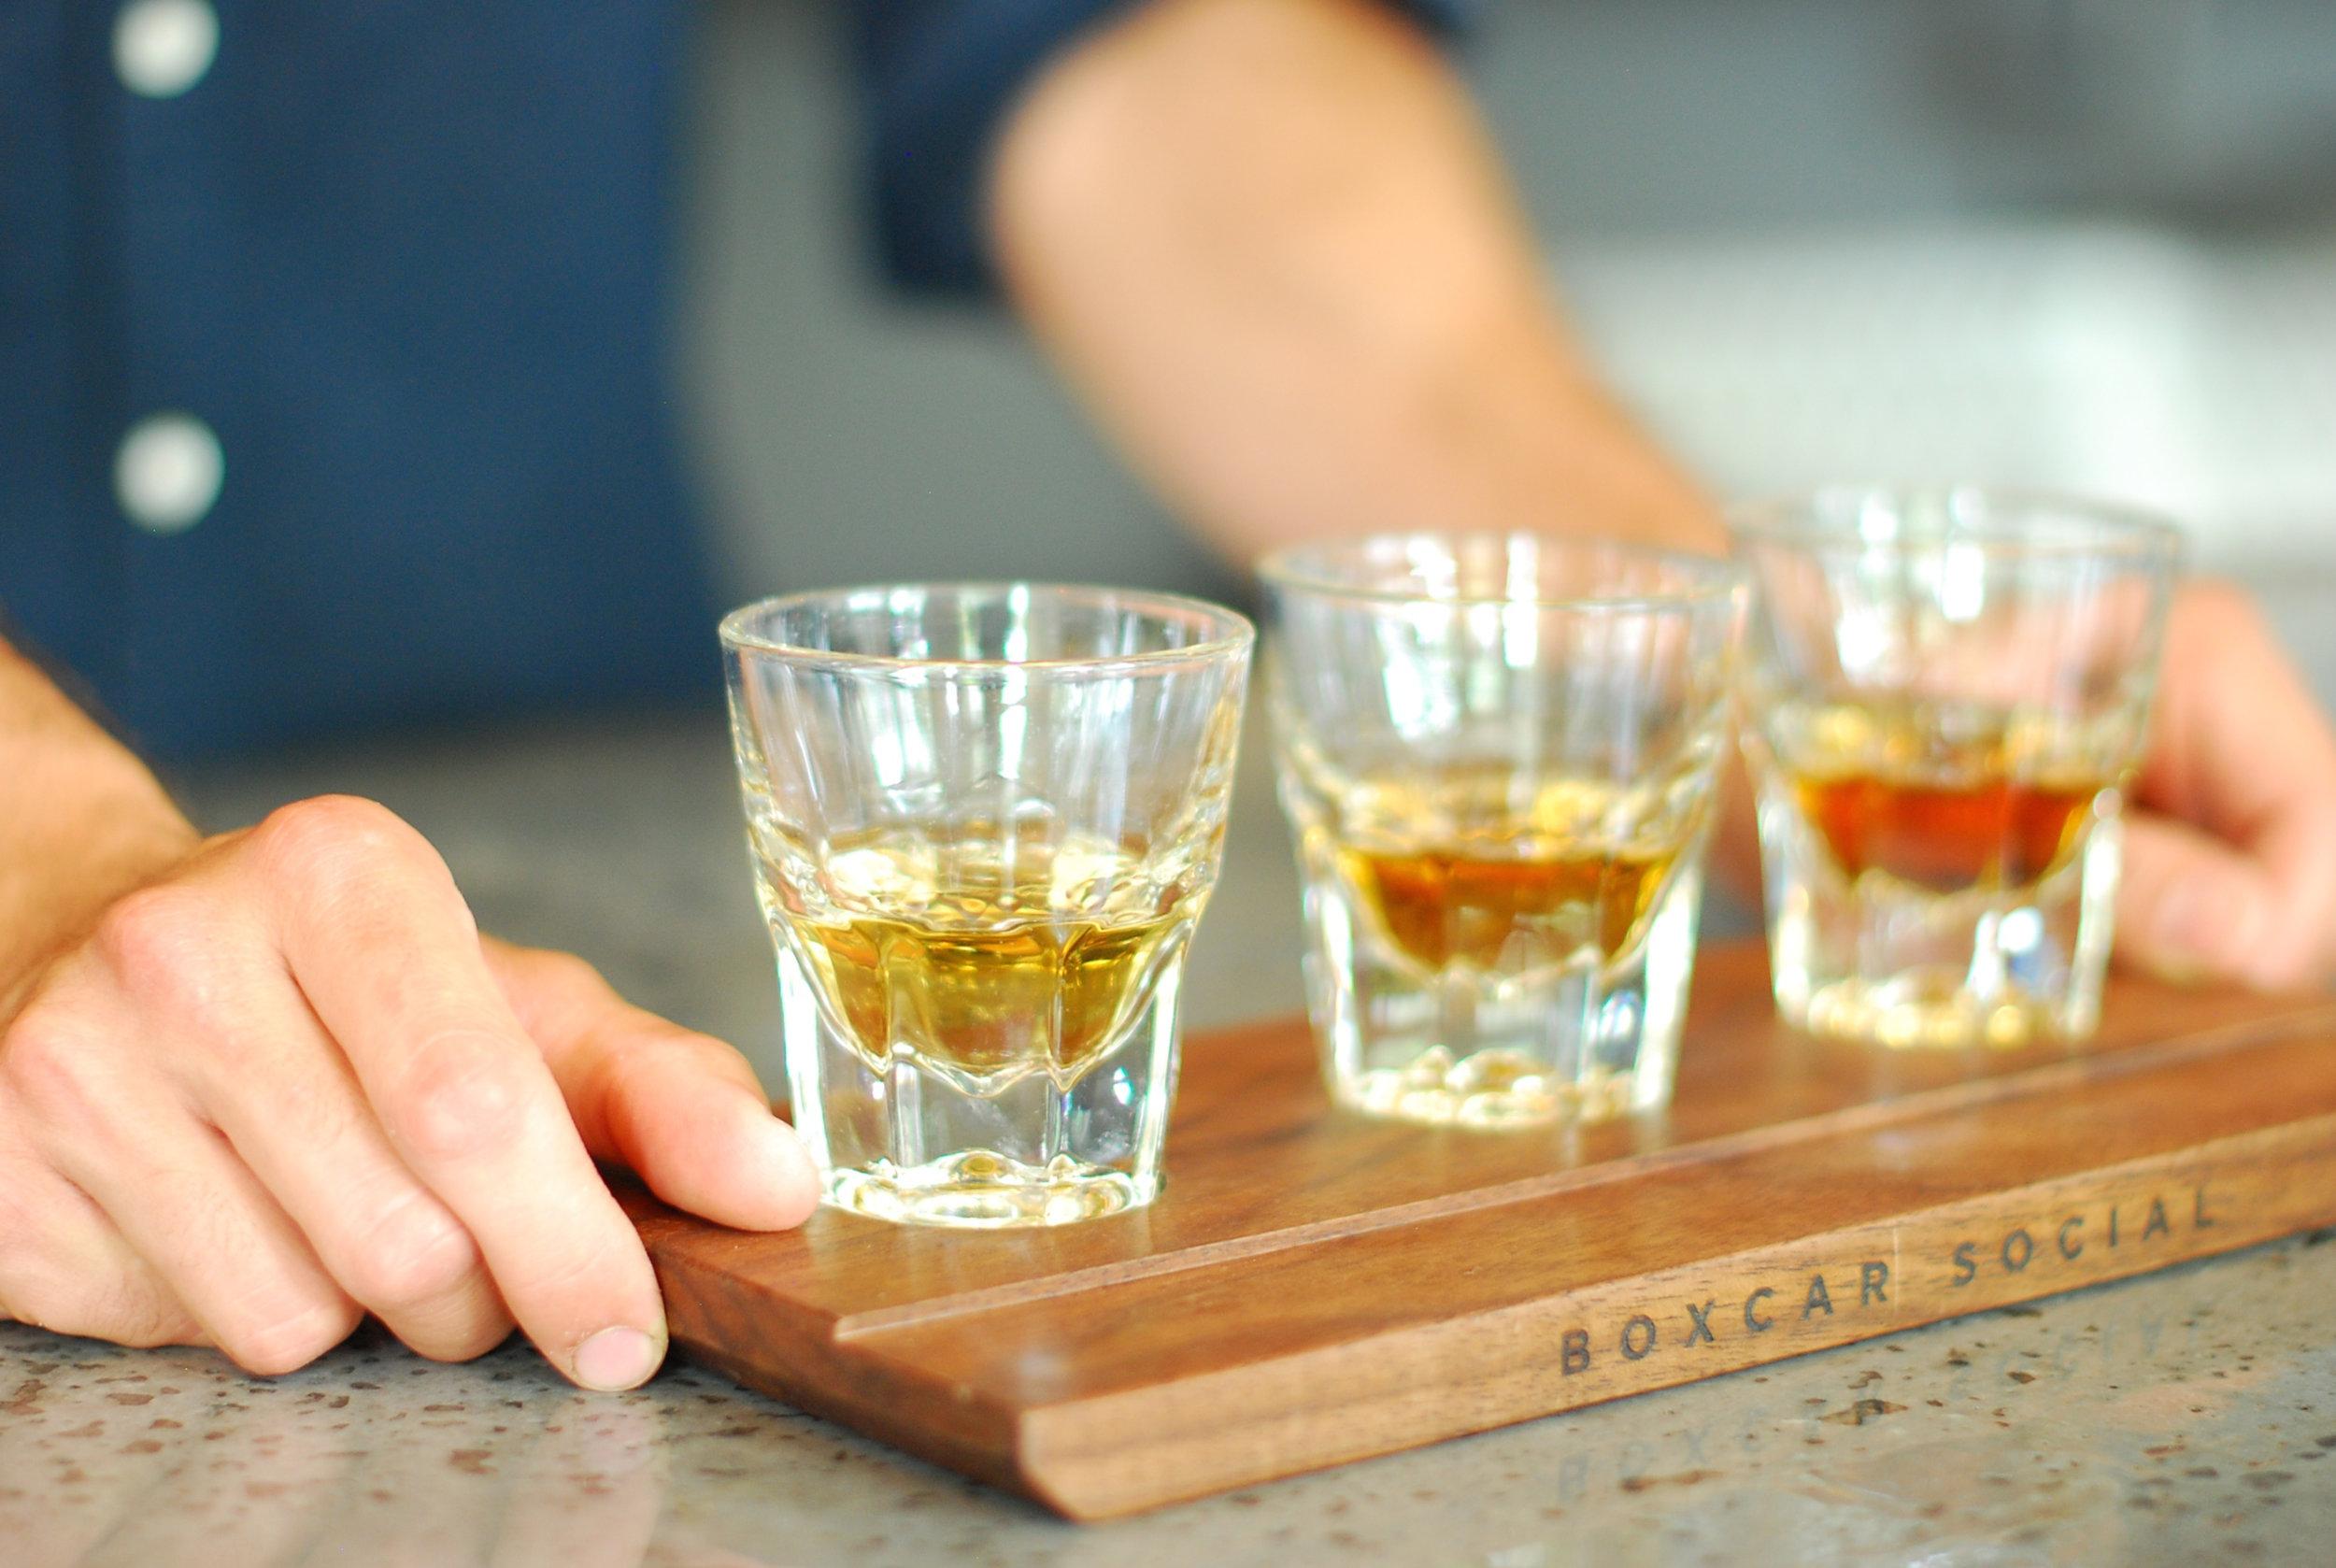 boxcar.whiskey.jpg